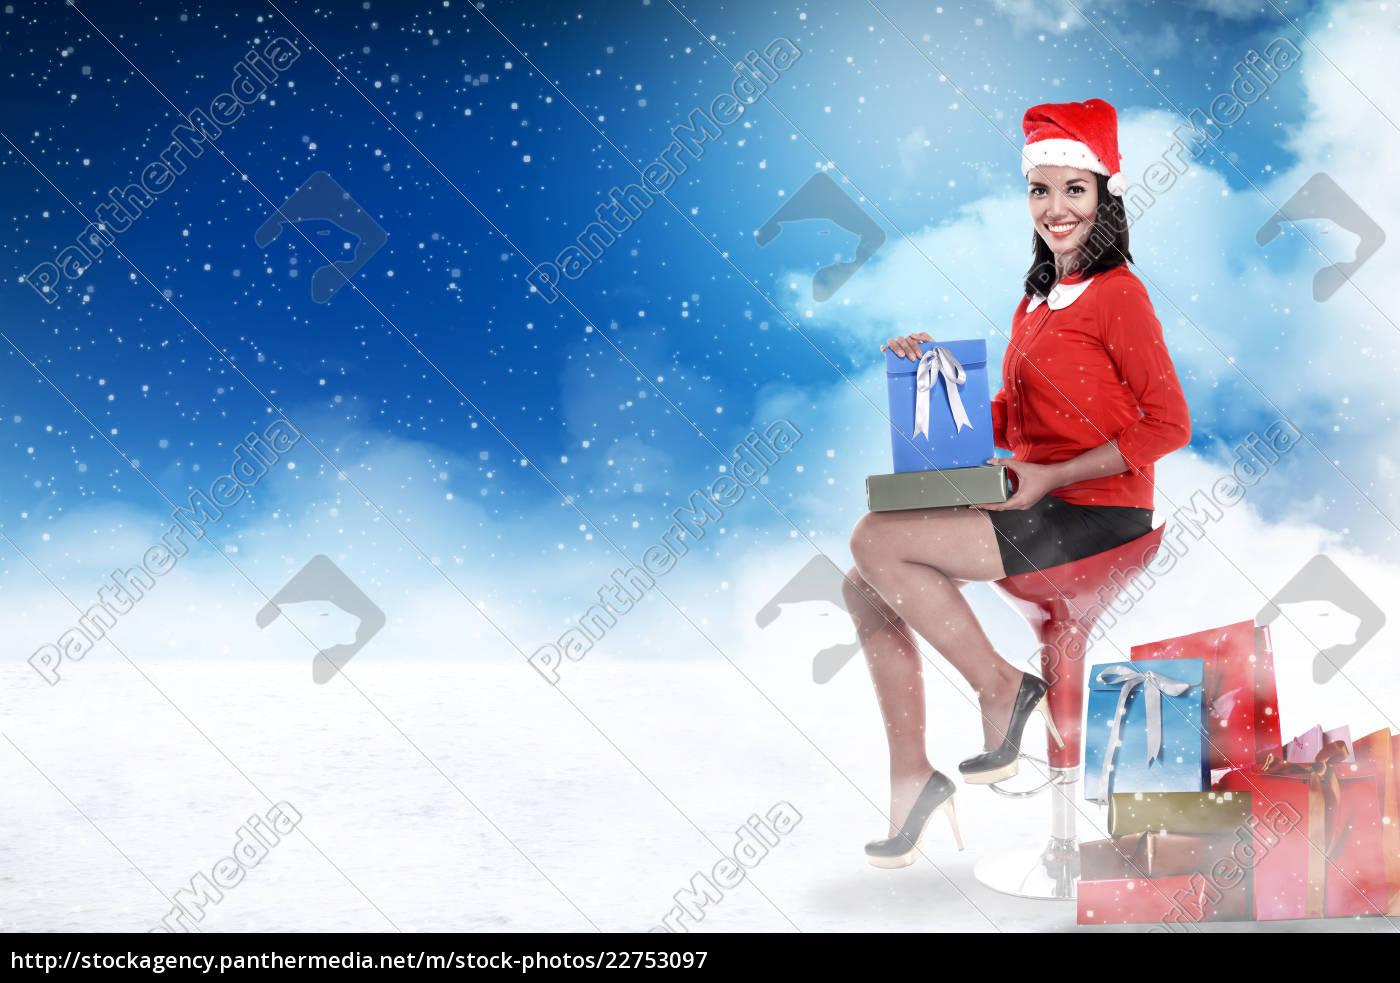 asian, woman, wearing, santa, hat, holding - 22753097